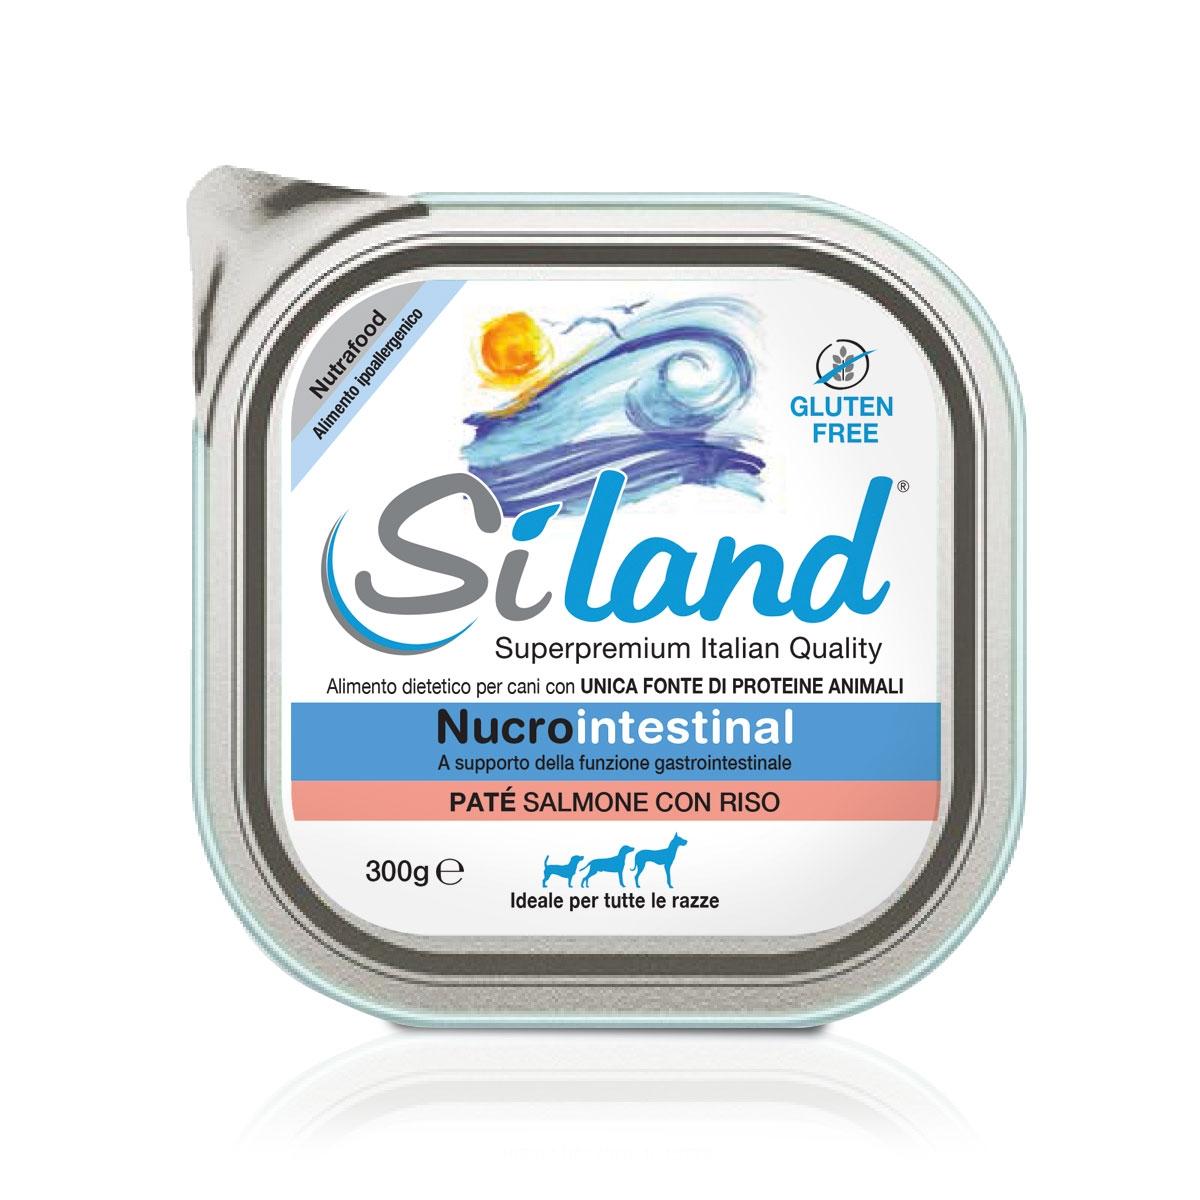 SILAND NUCROINTESTINAL PATE SALMONE E RISO ALIMEN